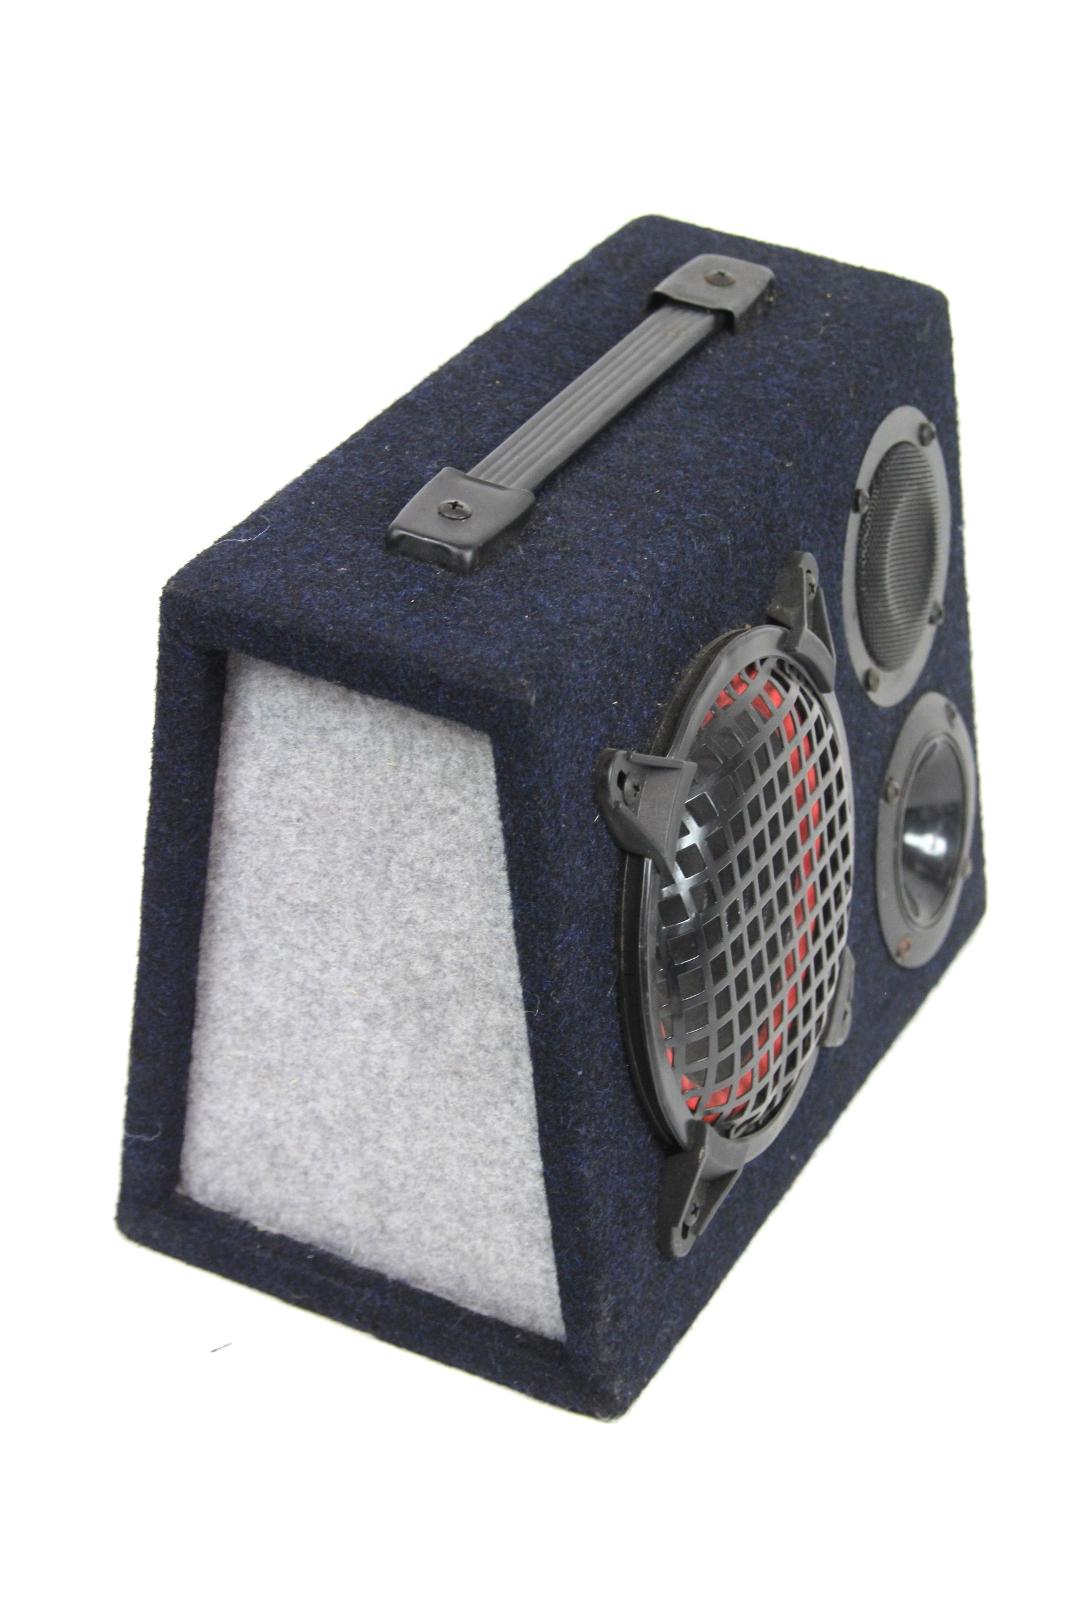 kfz lautsprechersystem mittelt ner tieft ner bass lautsprecher boxen in chassis ebay. Black Bedroom Furniture Sets. Home Design Ideas